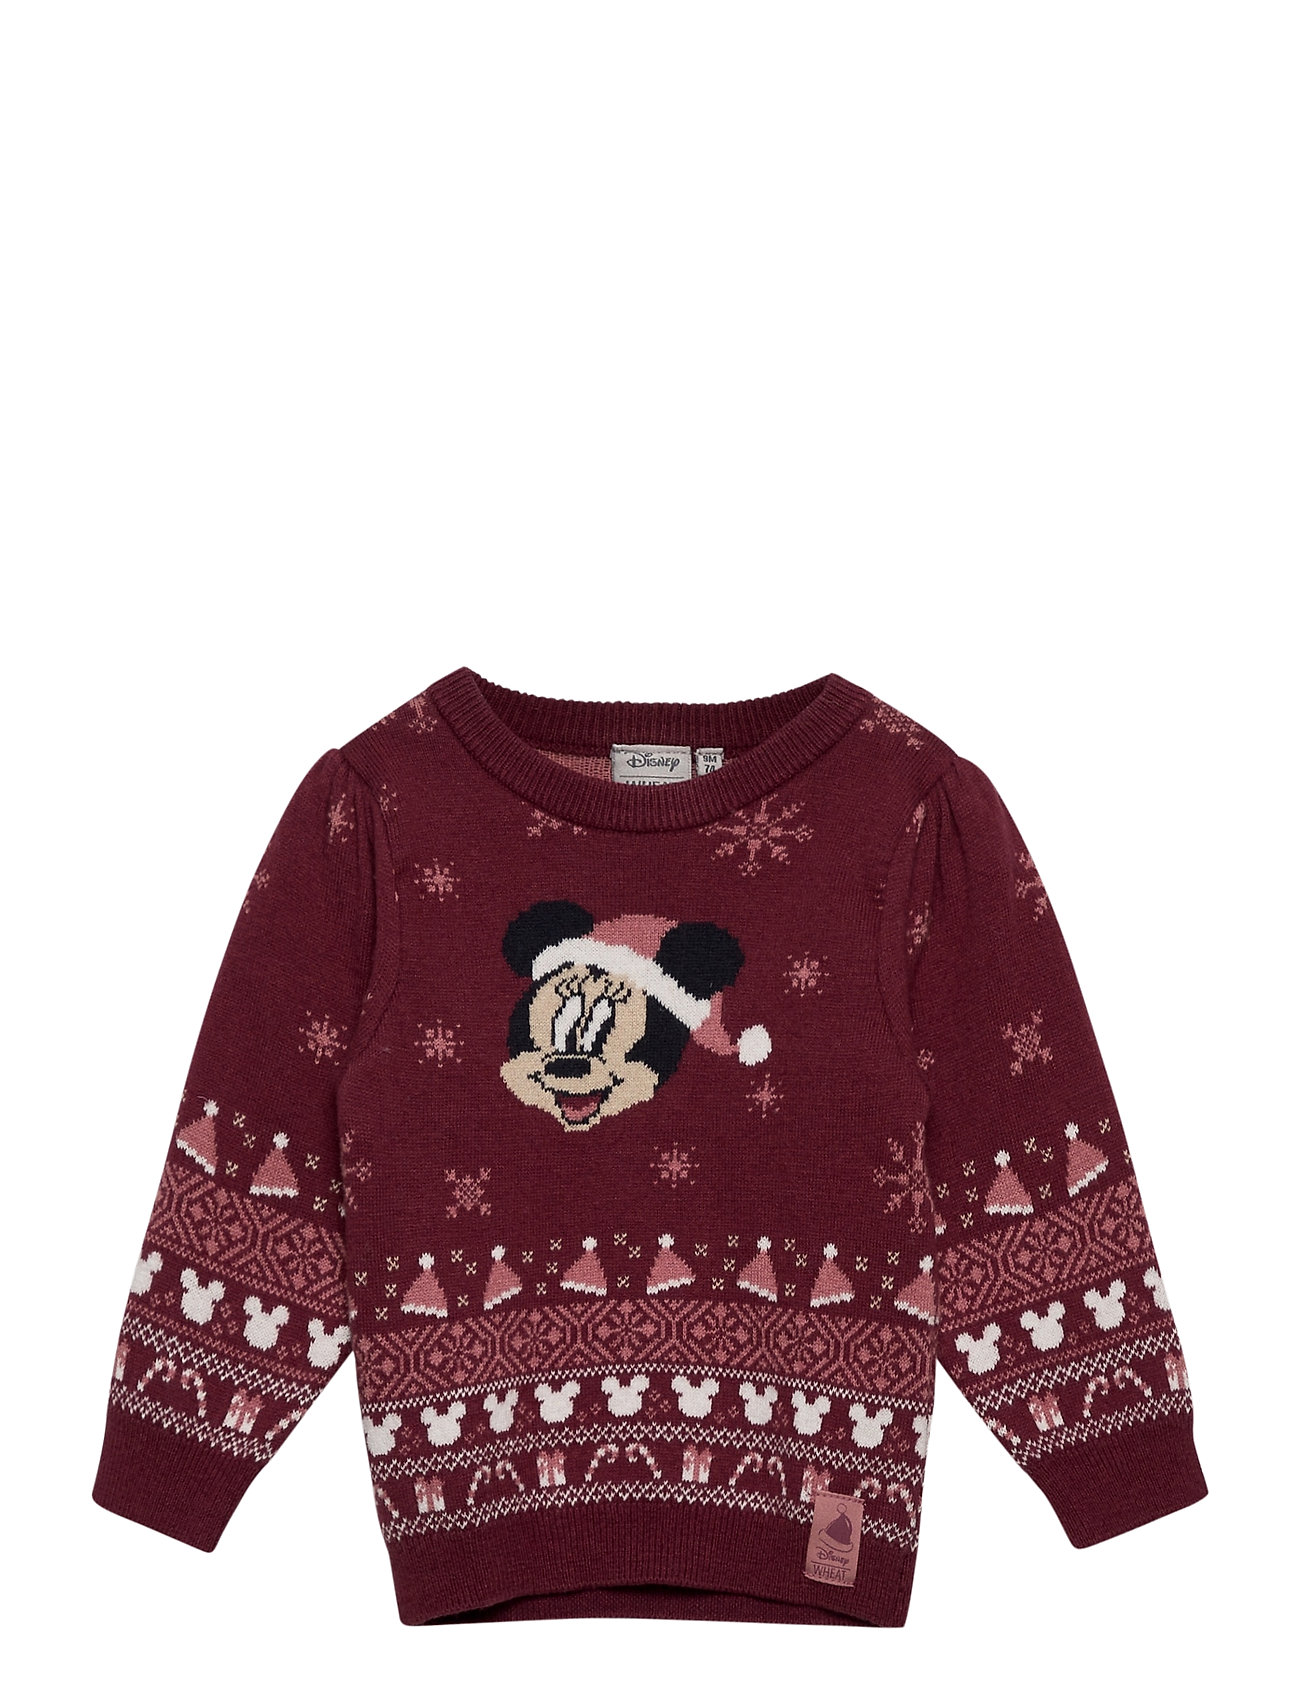 Image of Knit Pullover Minnie Pullover Striktrøje Rød Disney By Wheat (3458386833)